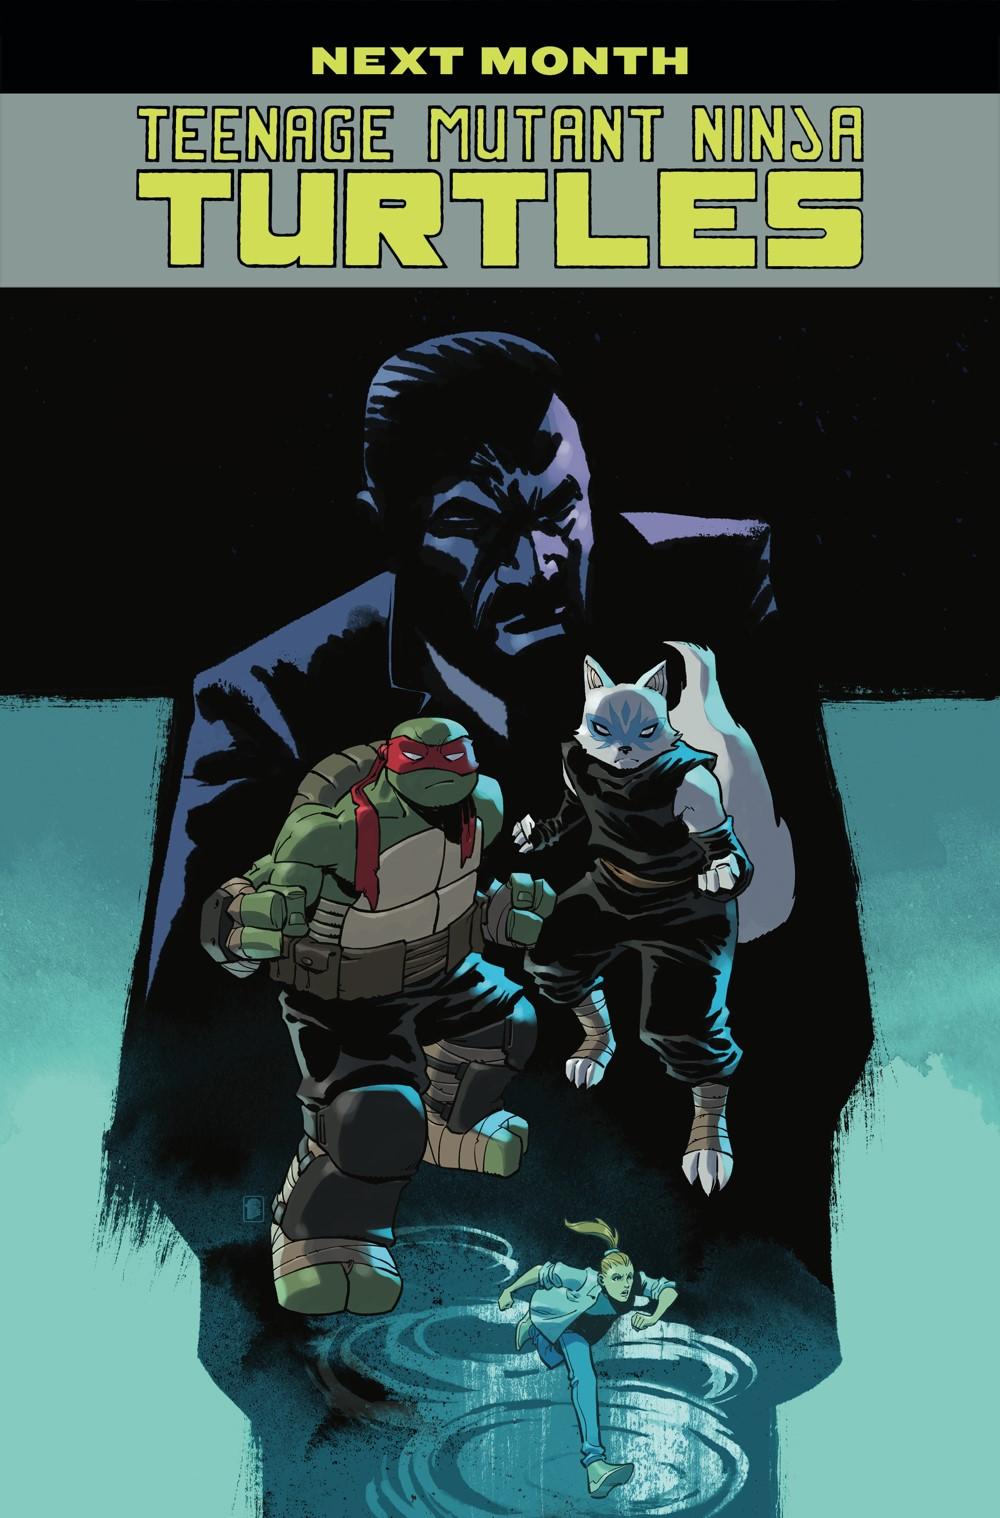 TMNT118_Next ComicList Previews: TEENAGE MUTANT NINJA TURTLES #118